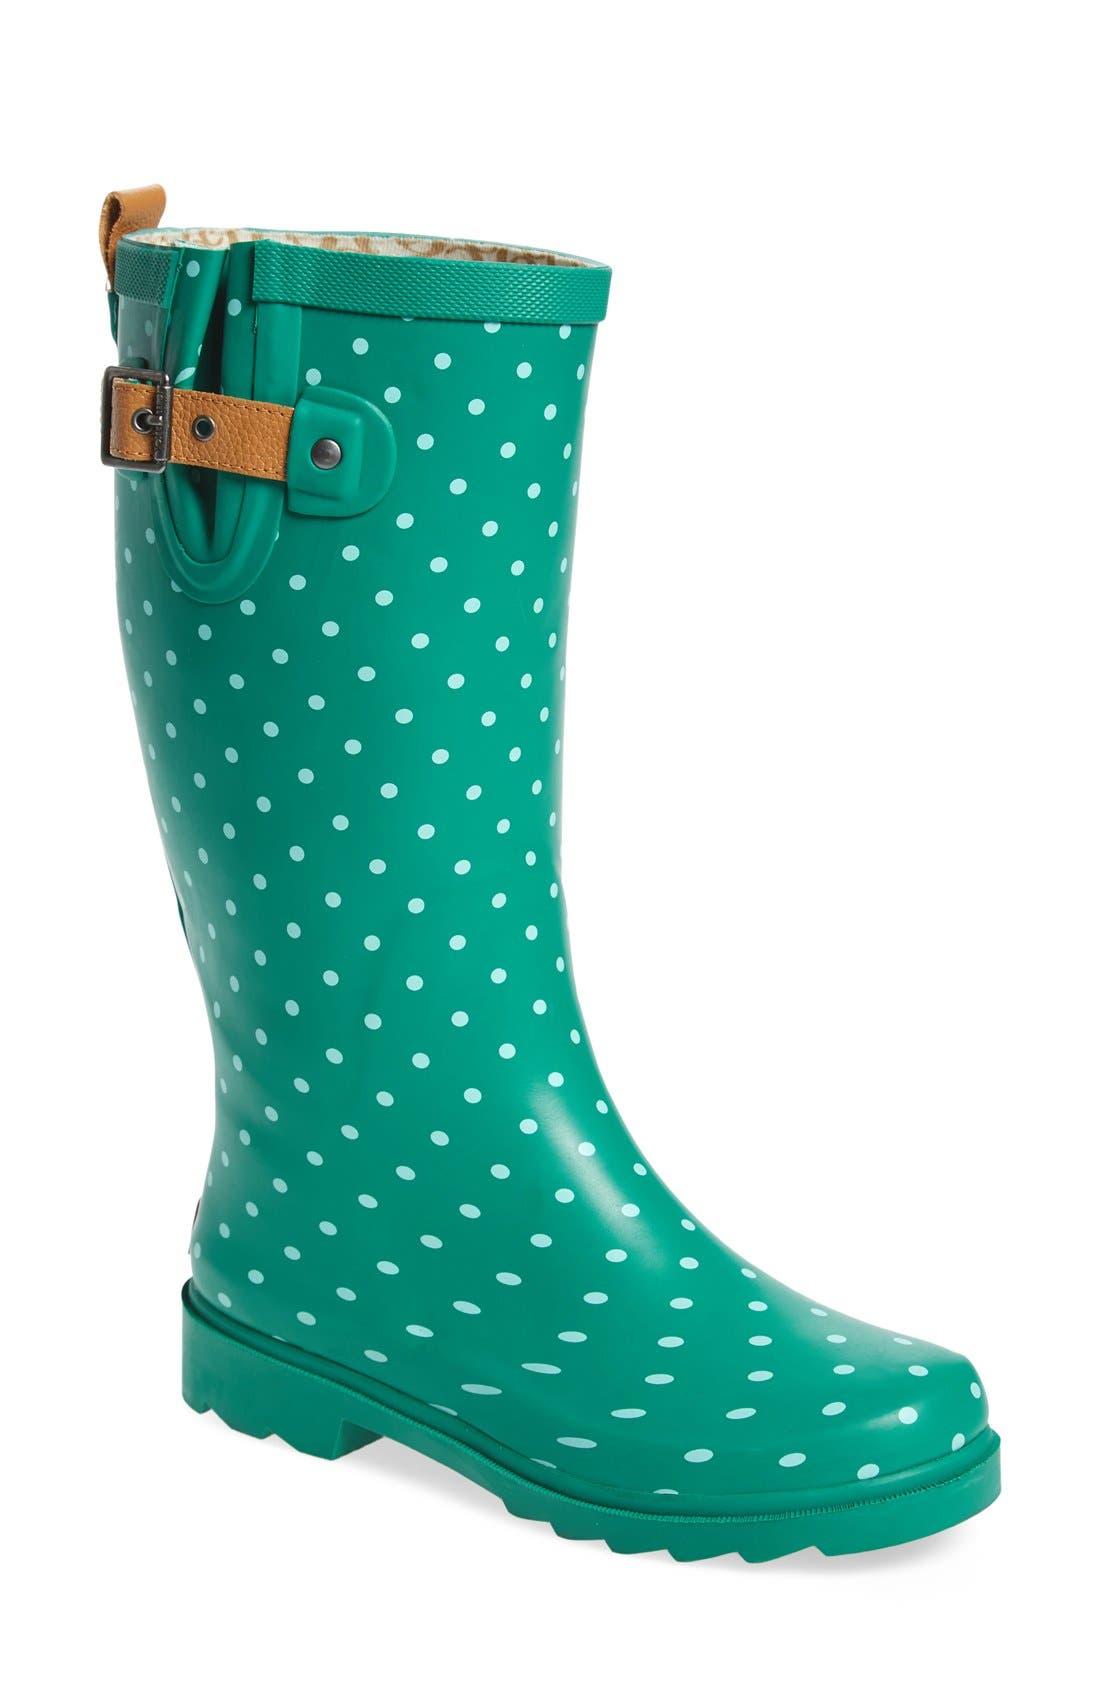 Main Image - Chooka 'Classic Dot' Rain Boot (Women)